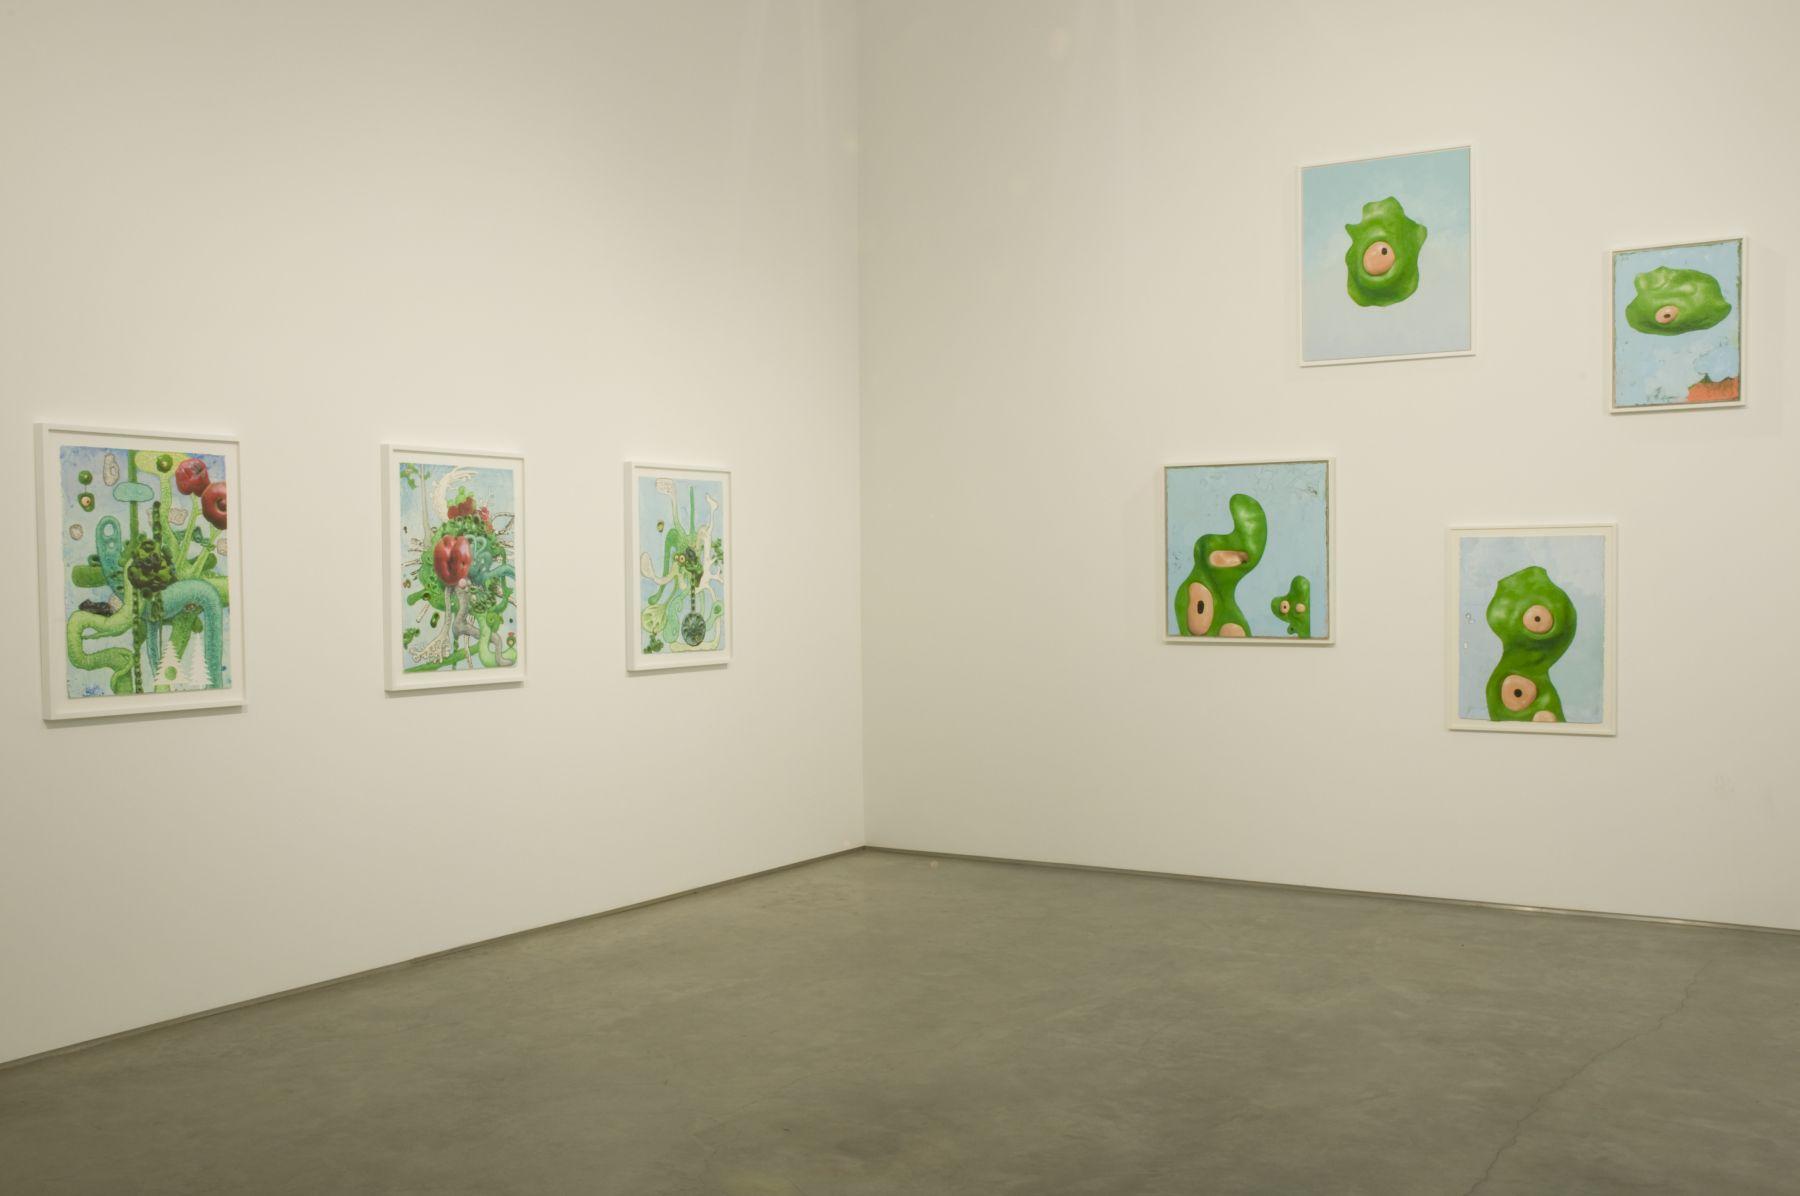 Installation View, Marianne Boesky Gallery, 2008